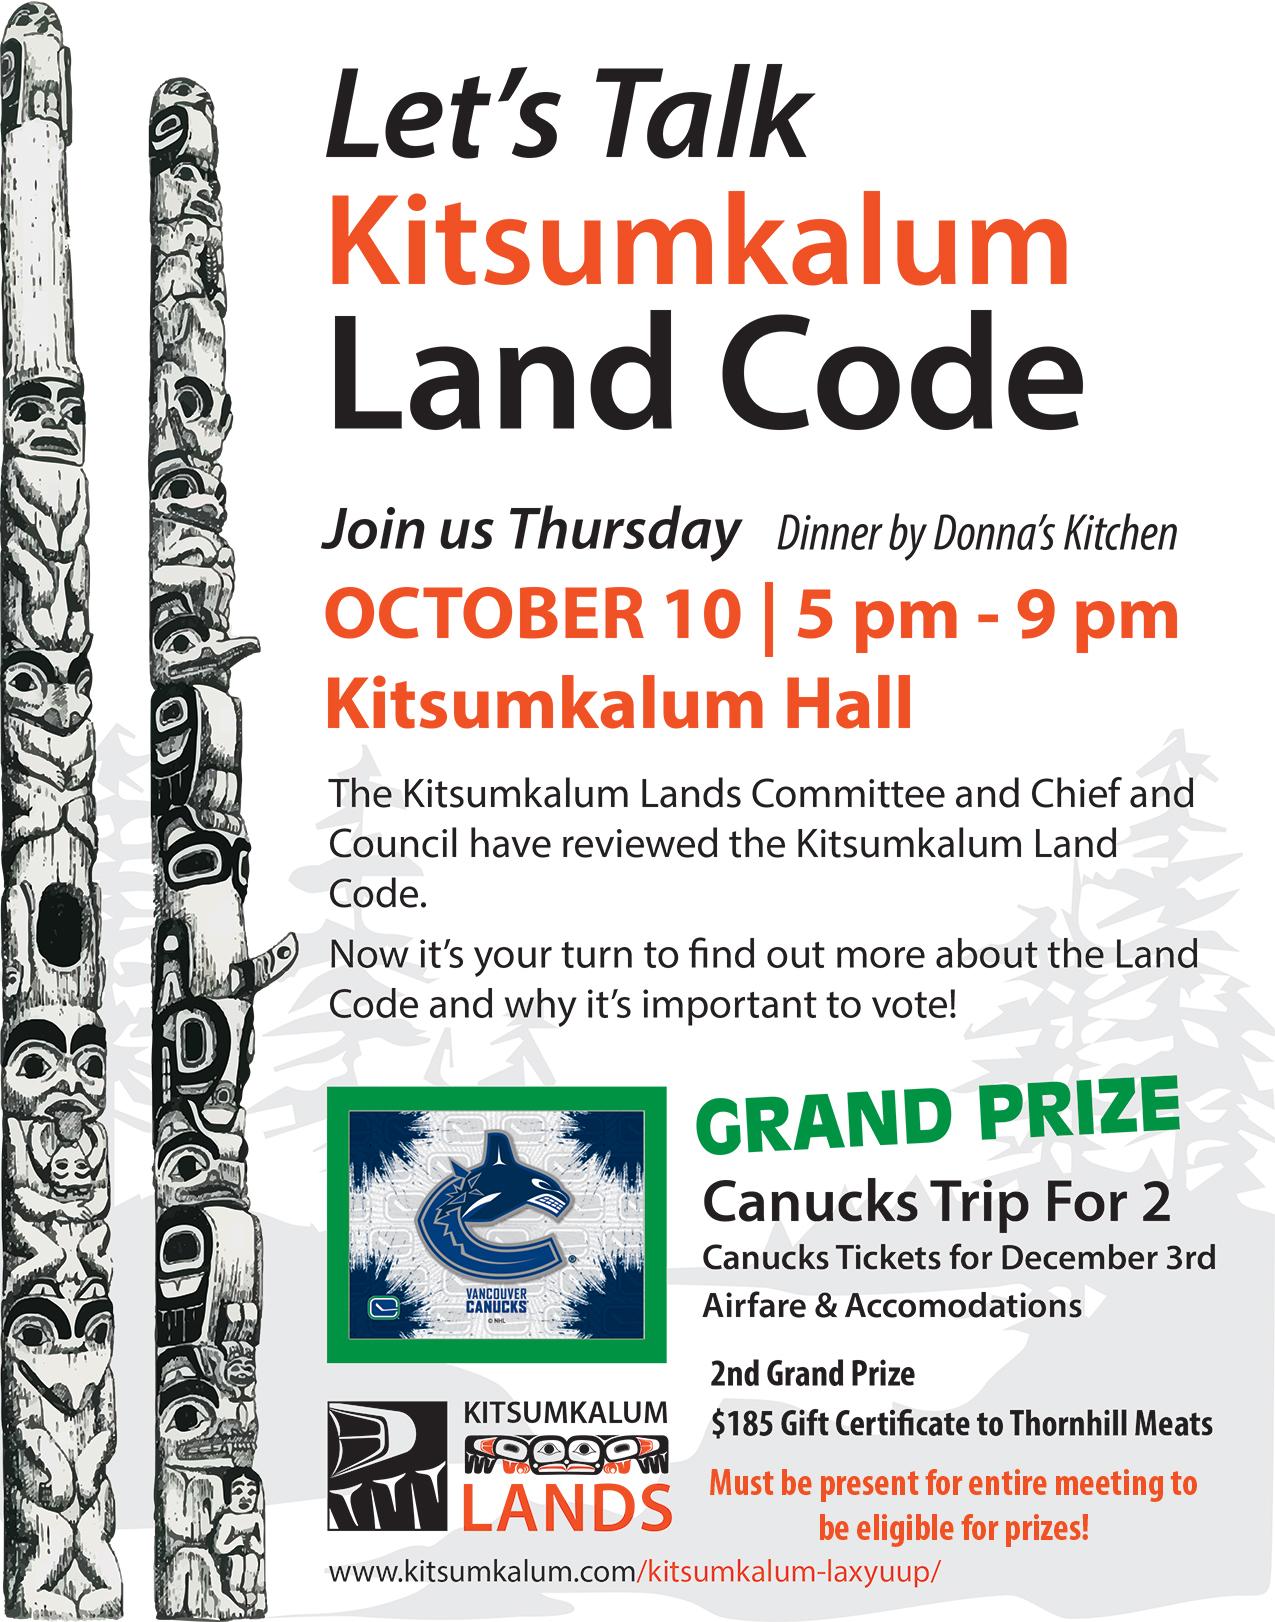 Let's Talk Land Code OCT 10